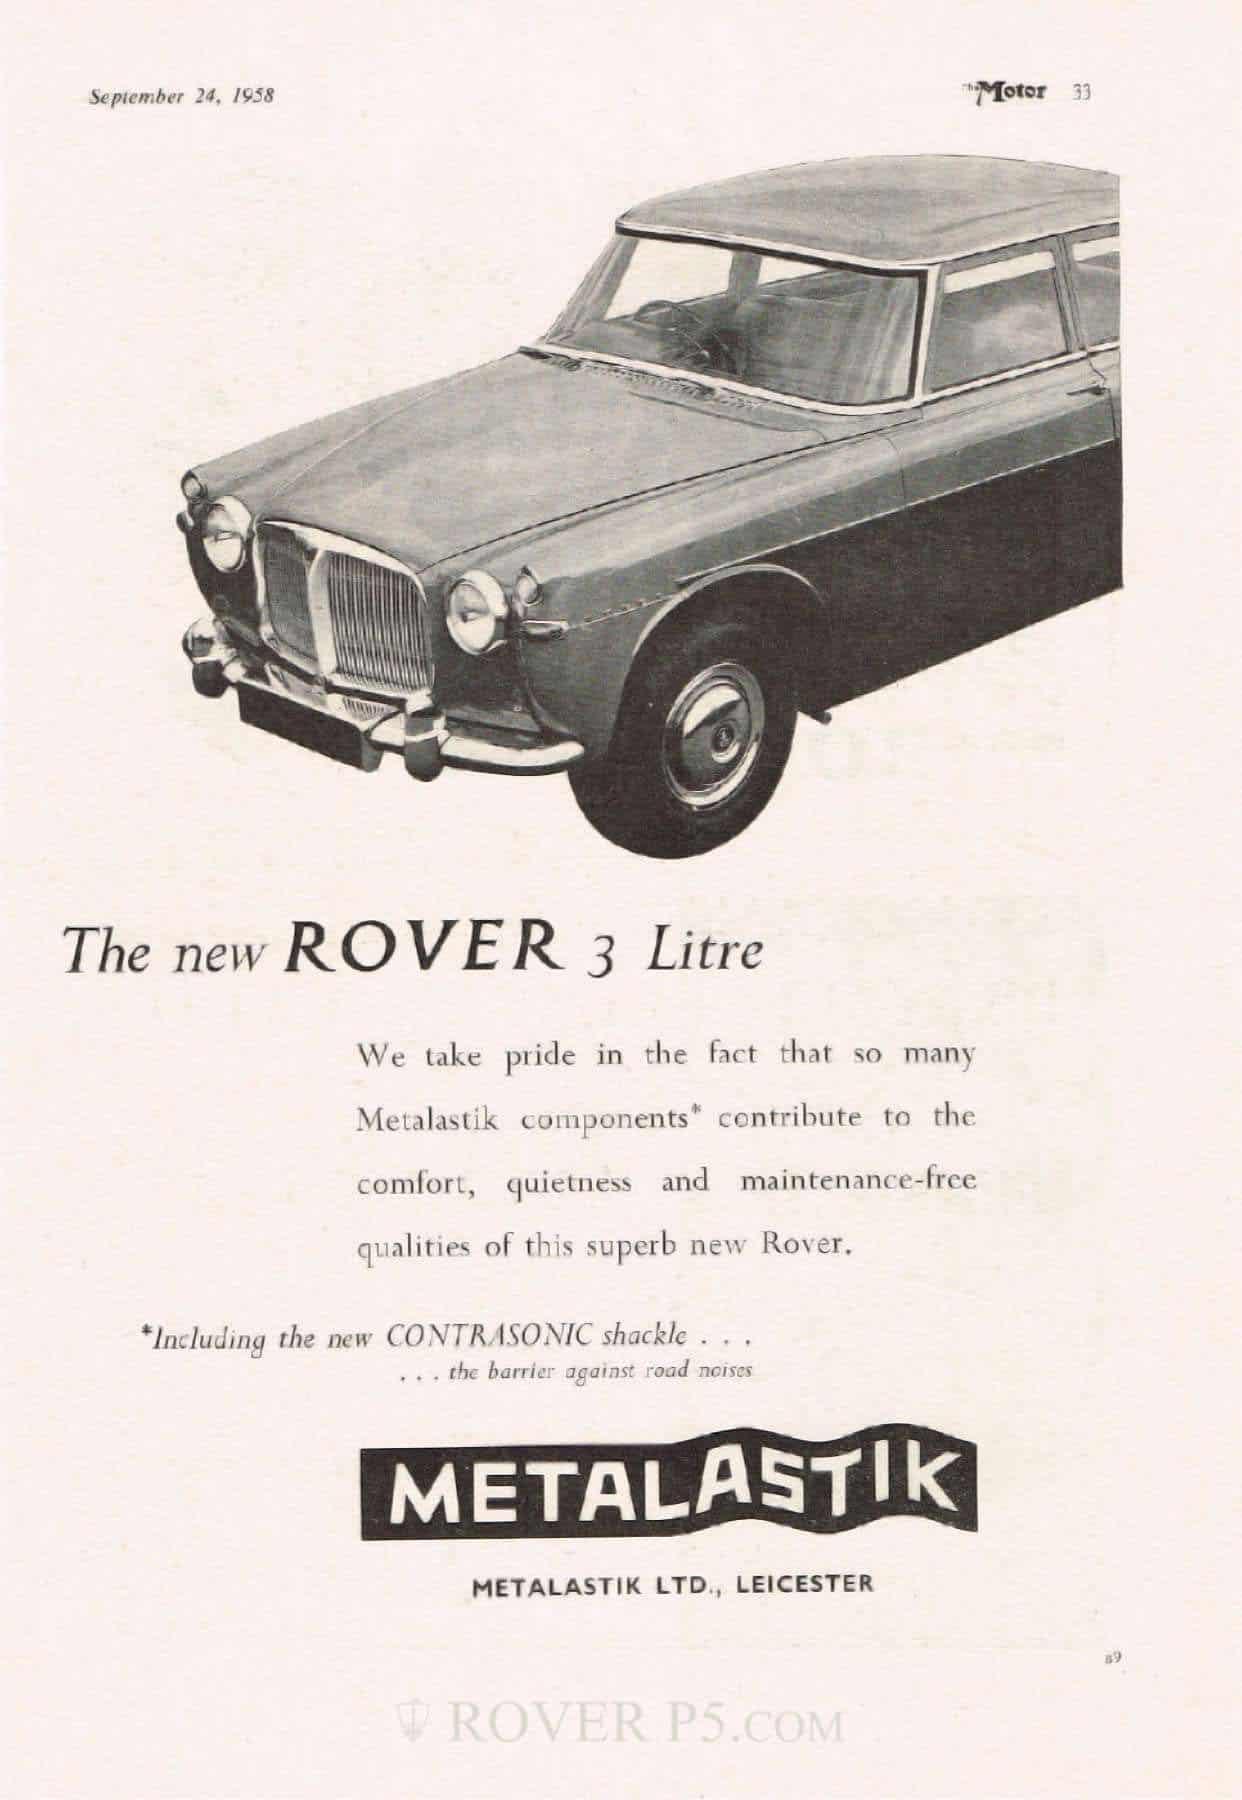 Advert - Metalastik Contrasonic Shackle 2